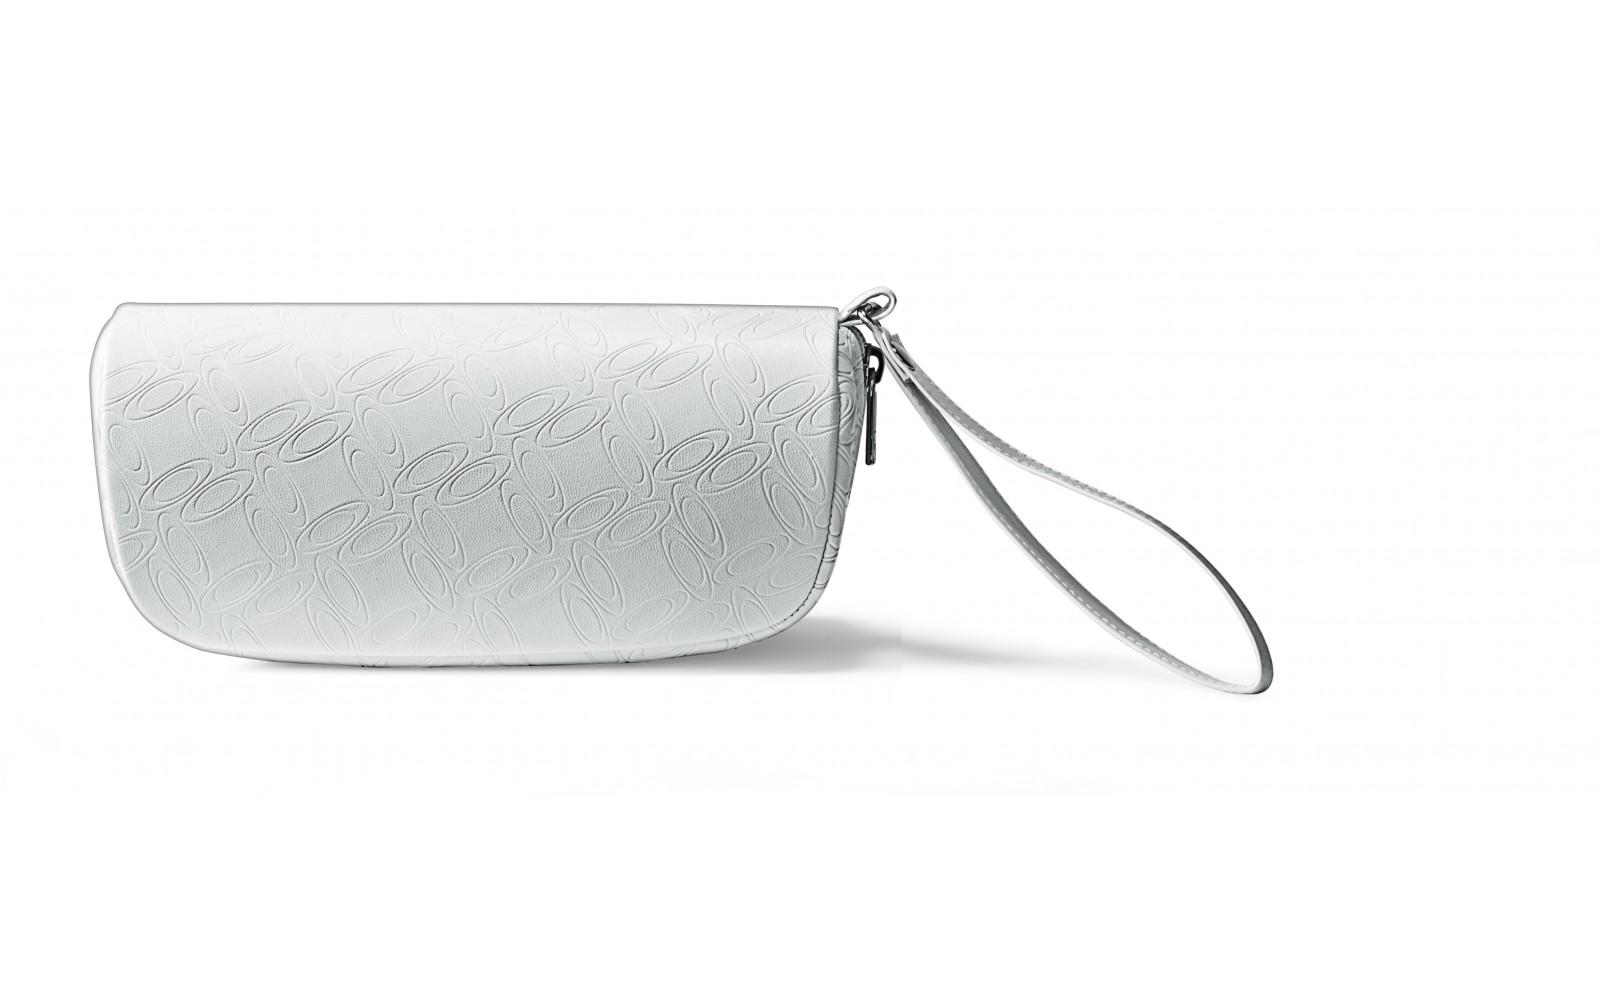 Oakley Women's Soft Sunglass Case - White - Brillenkoker